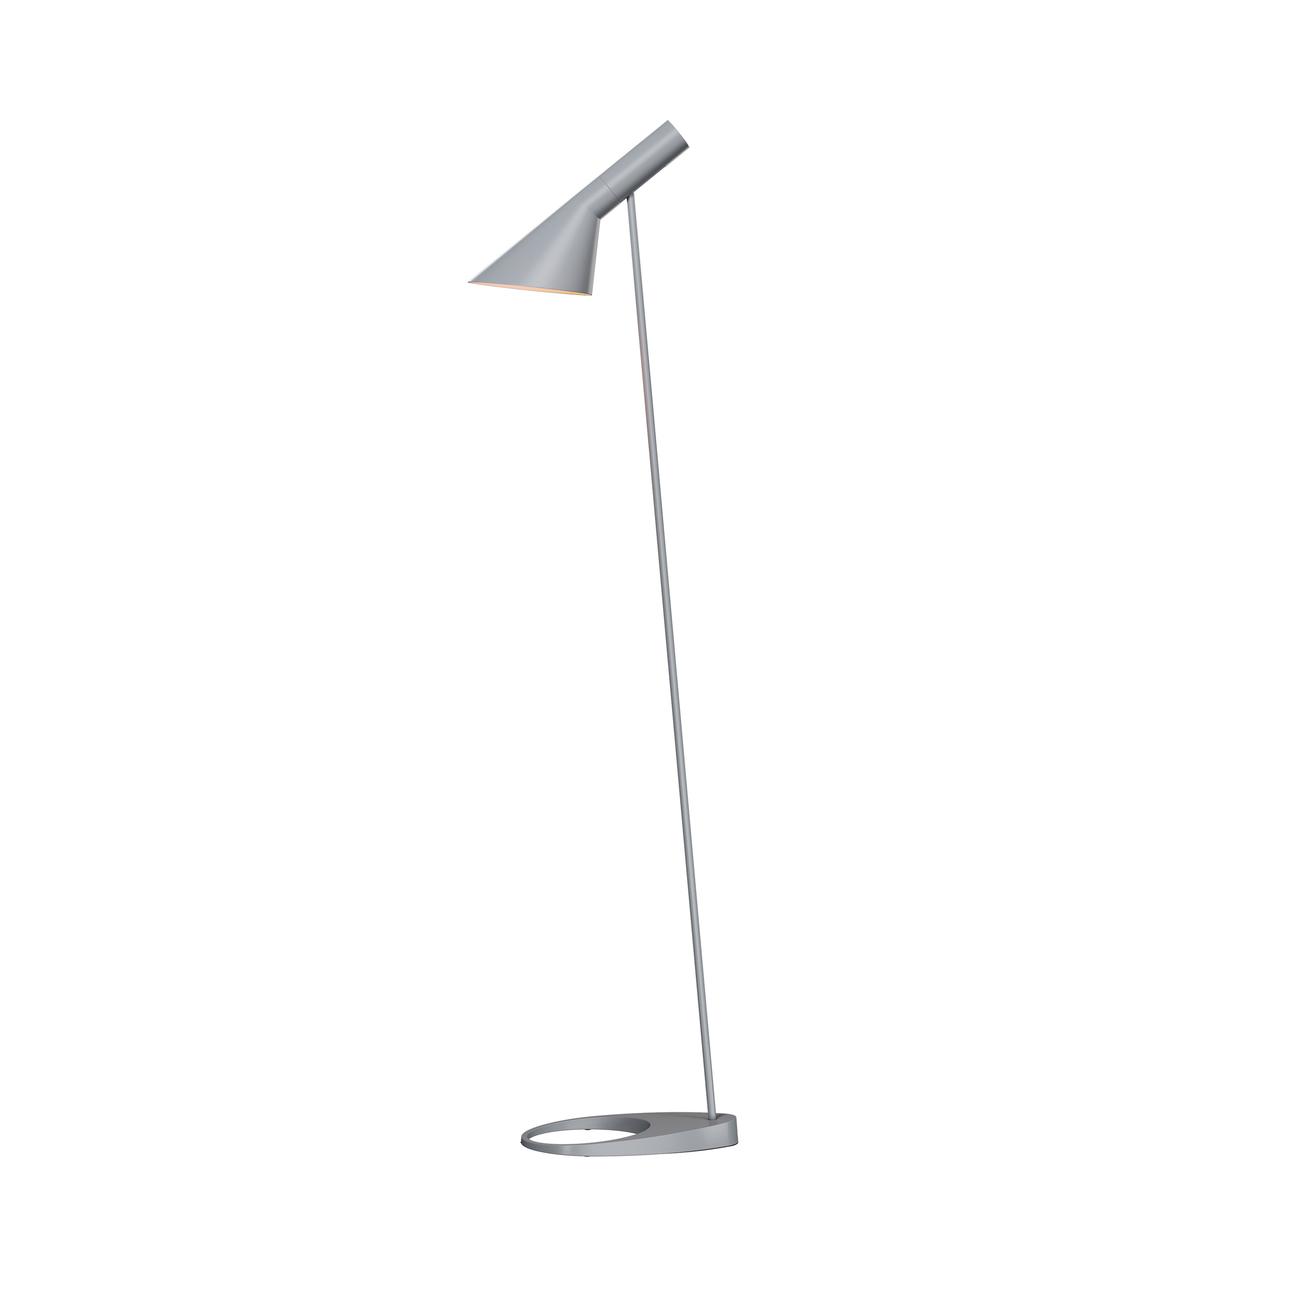 Louis Poulsen AJ vloerlamp-Licht grijs